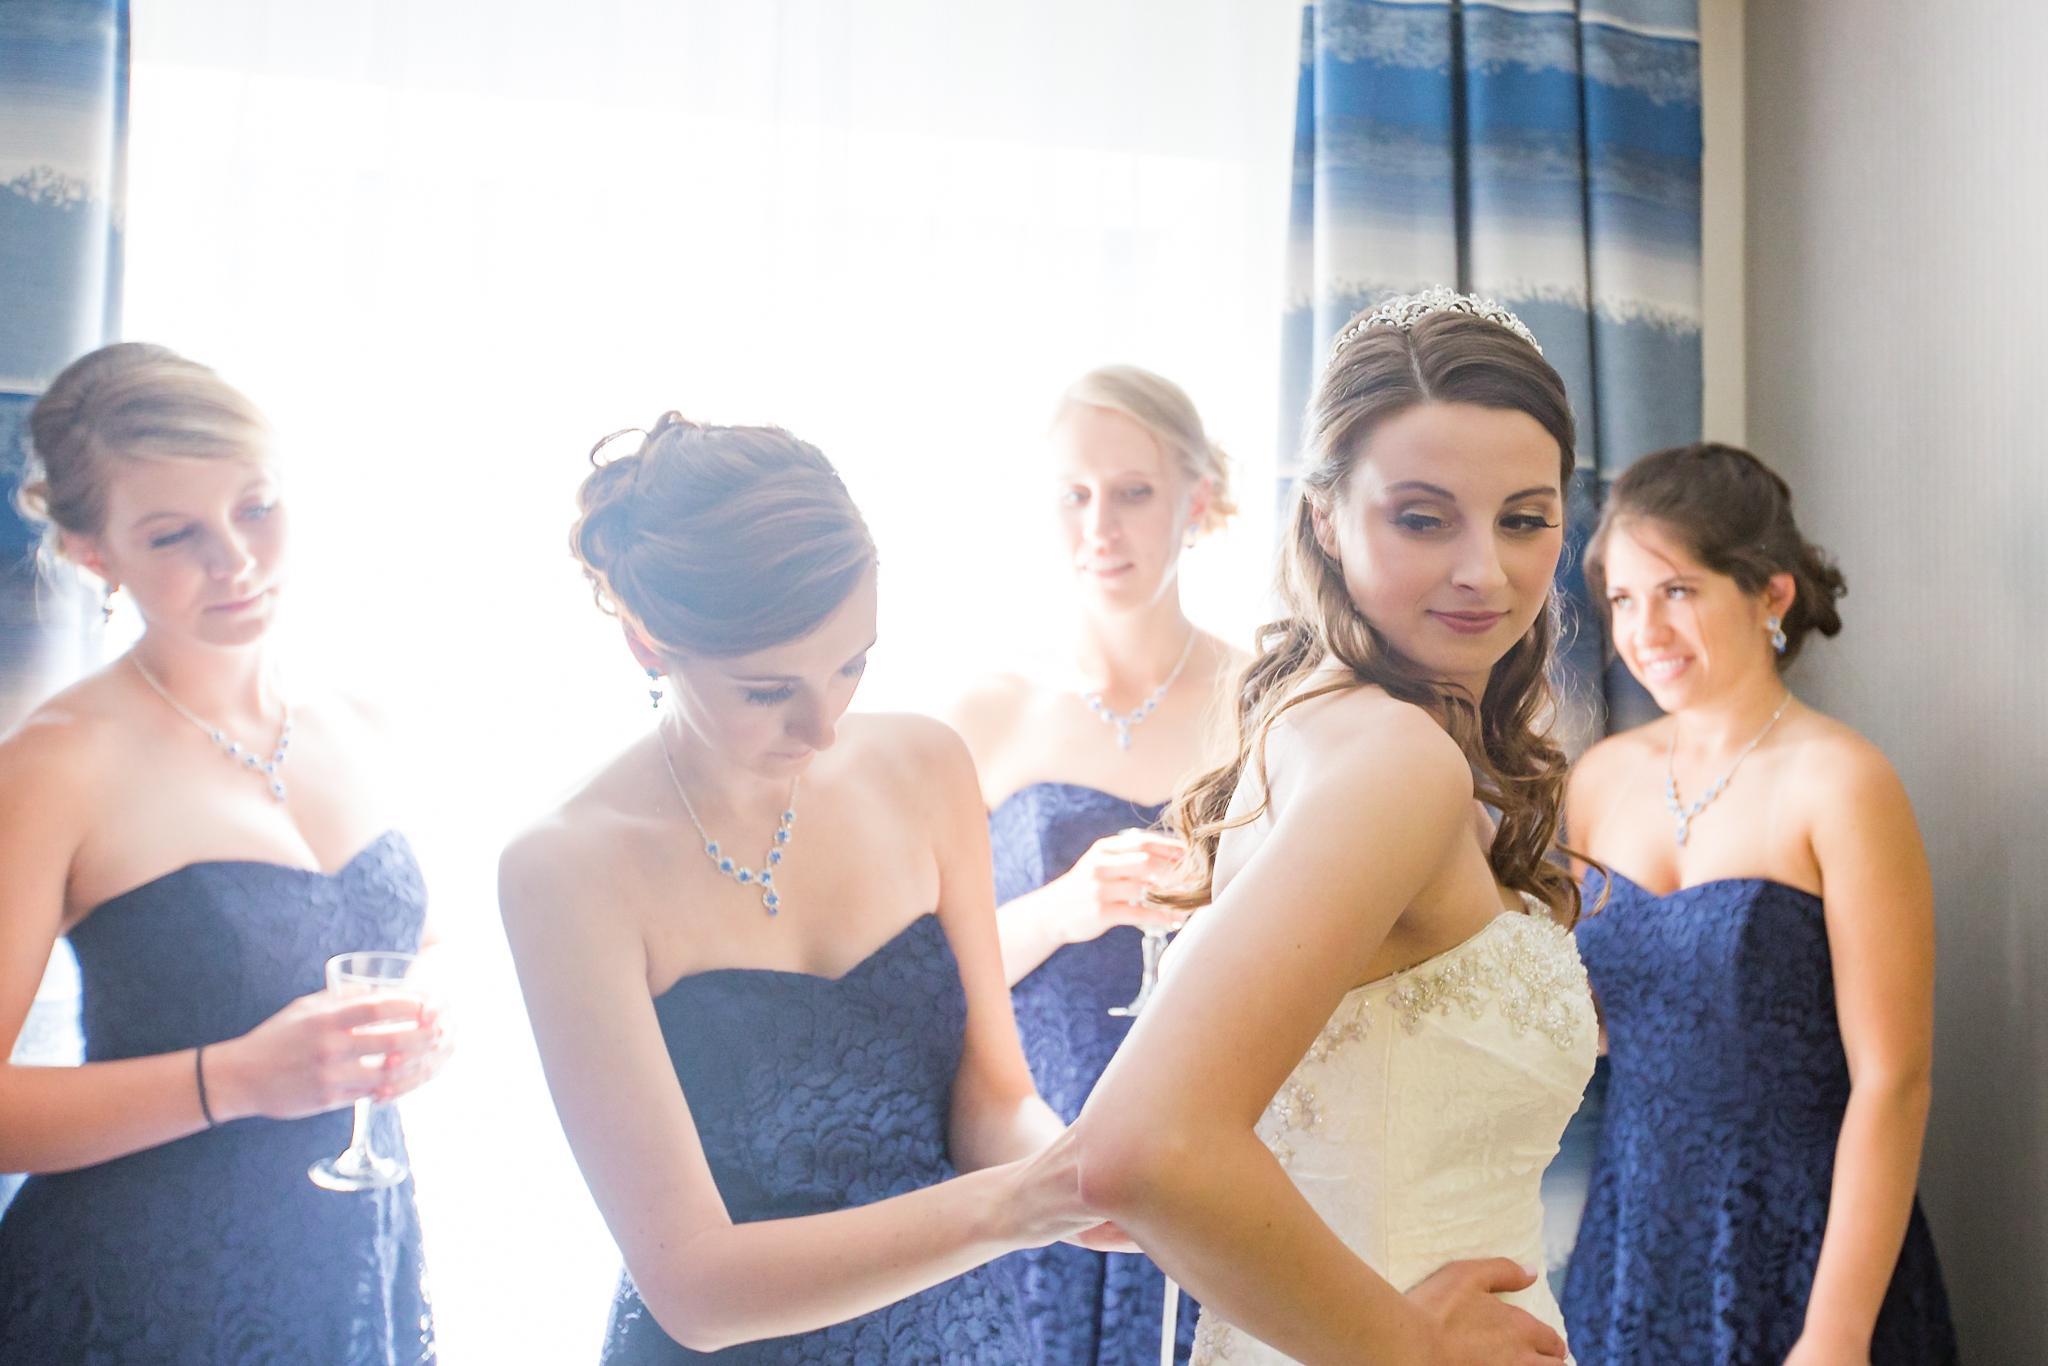 Wedding Planning: Bridesmaids' FAQs | Shaina Lee Photography | CT, NYC + Destination Wedding + Engagement Photographer | Wedding Planning | Wedding Planning for Bridesmaids | Vintage Inspired Wedding in Trumbull, CT | Wedding at Tashua Knolls Banquet Facility